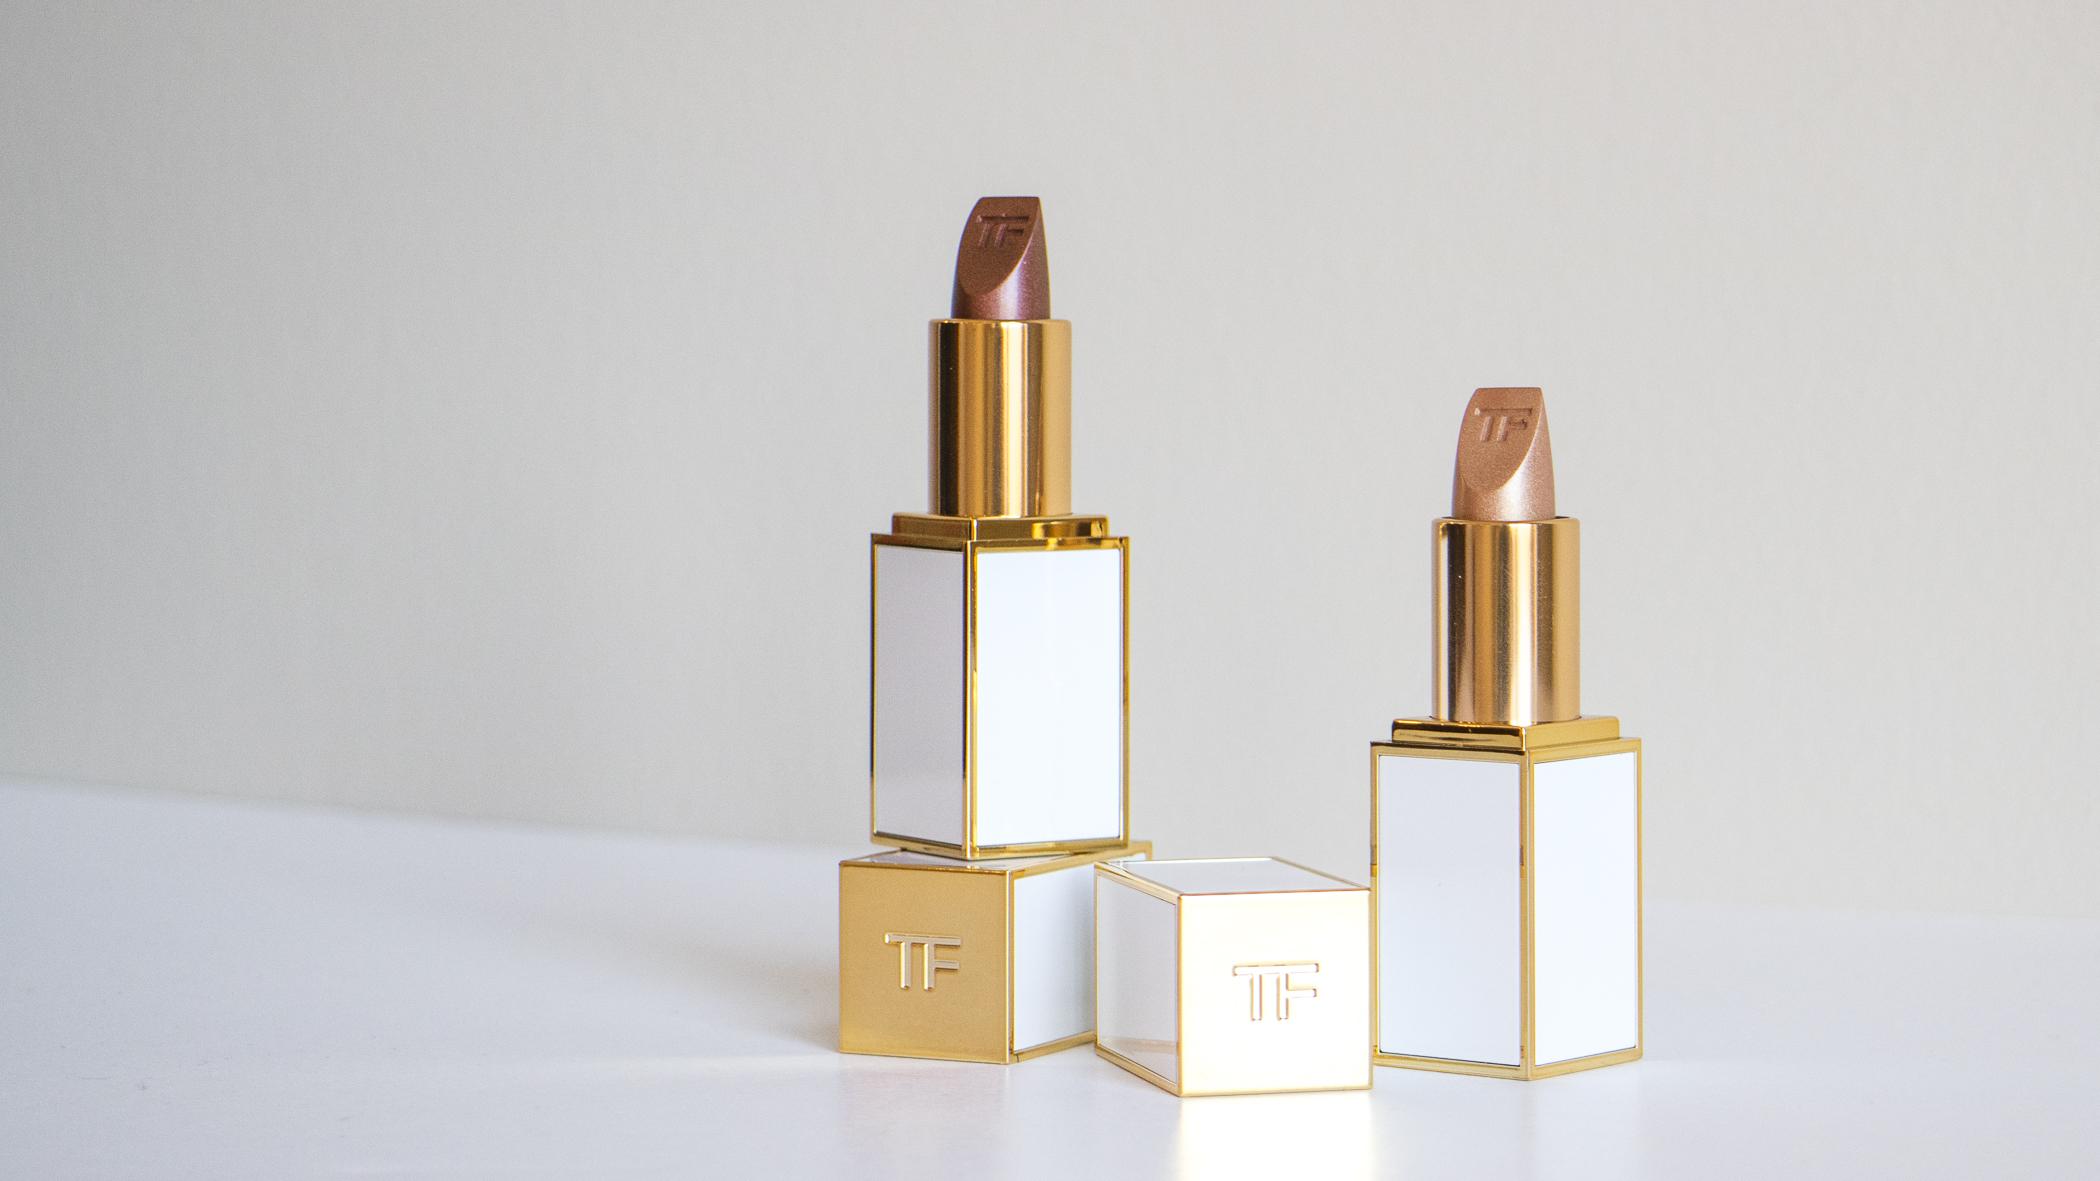 Lip Foils in Aperture (L) and Private Life (R)